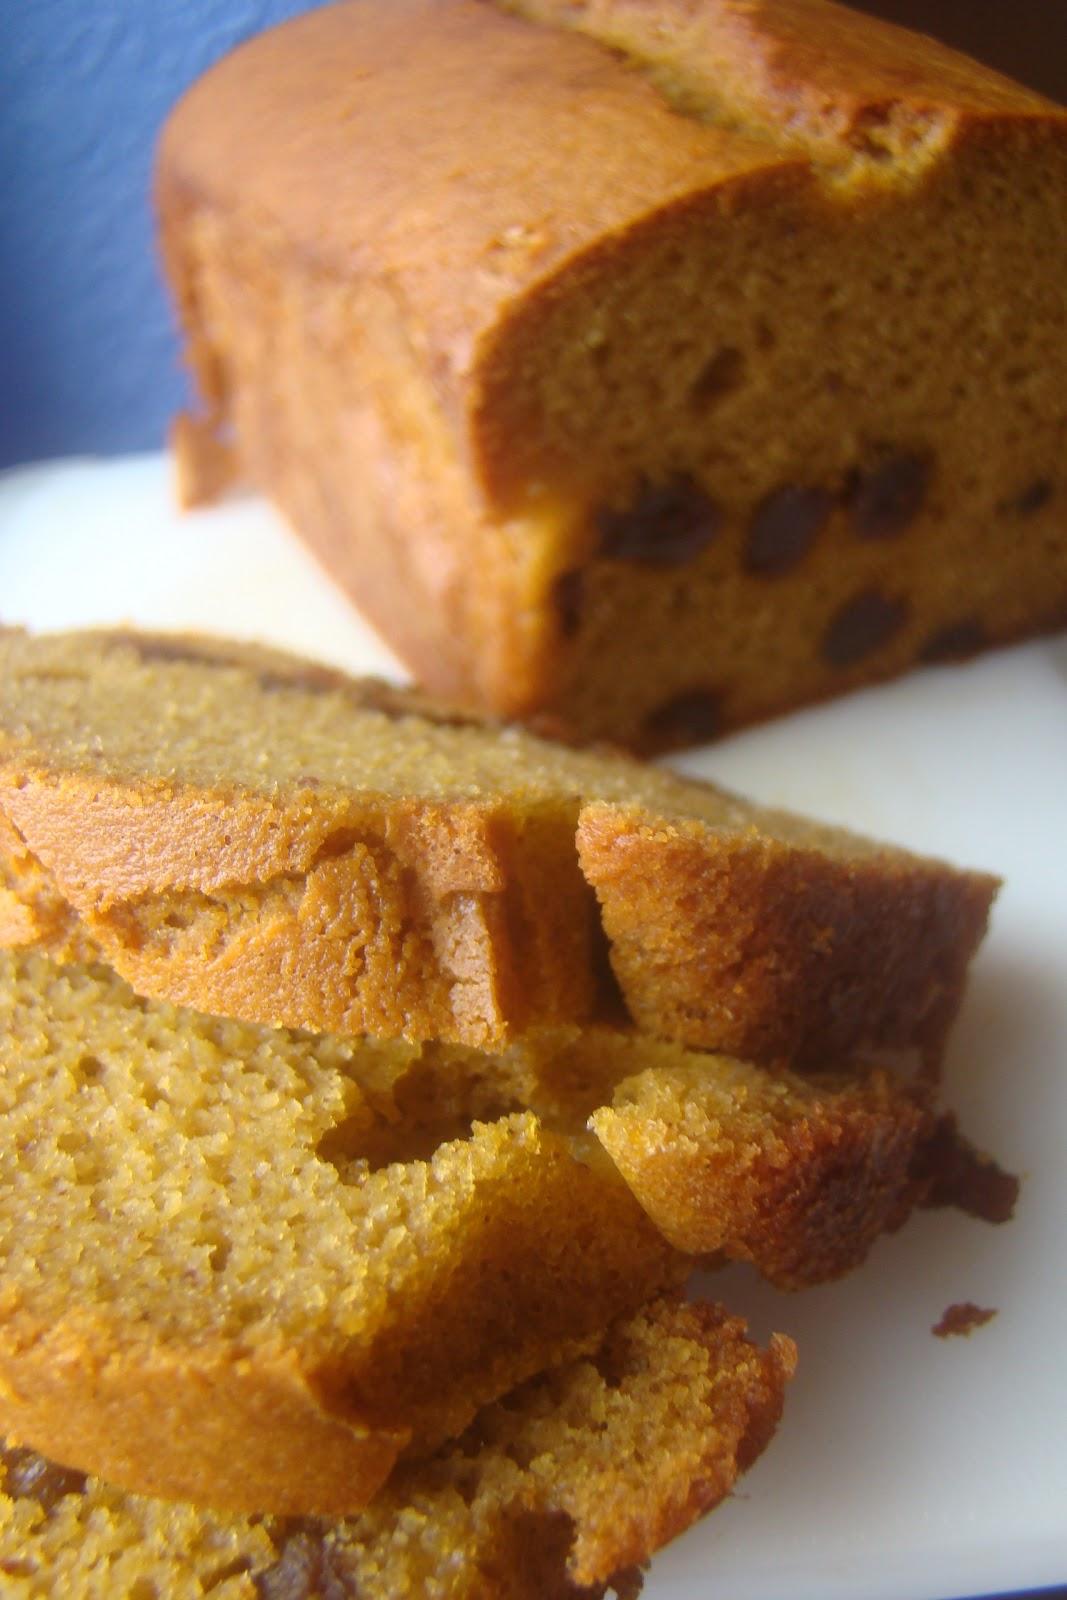 ... : Grain-free Cinnamon Raisin Bread (GAPS-legal, primal, gluten-free